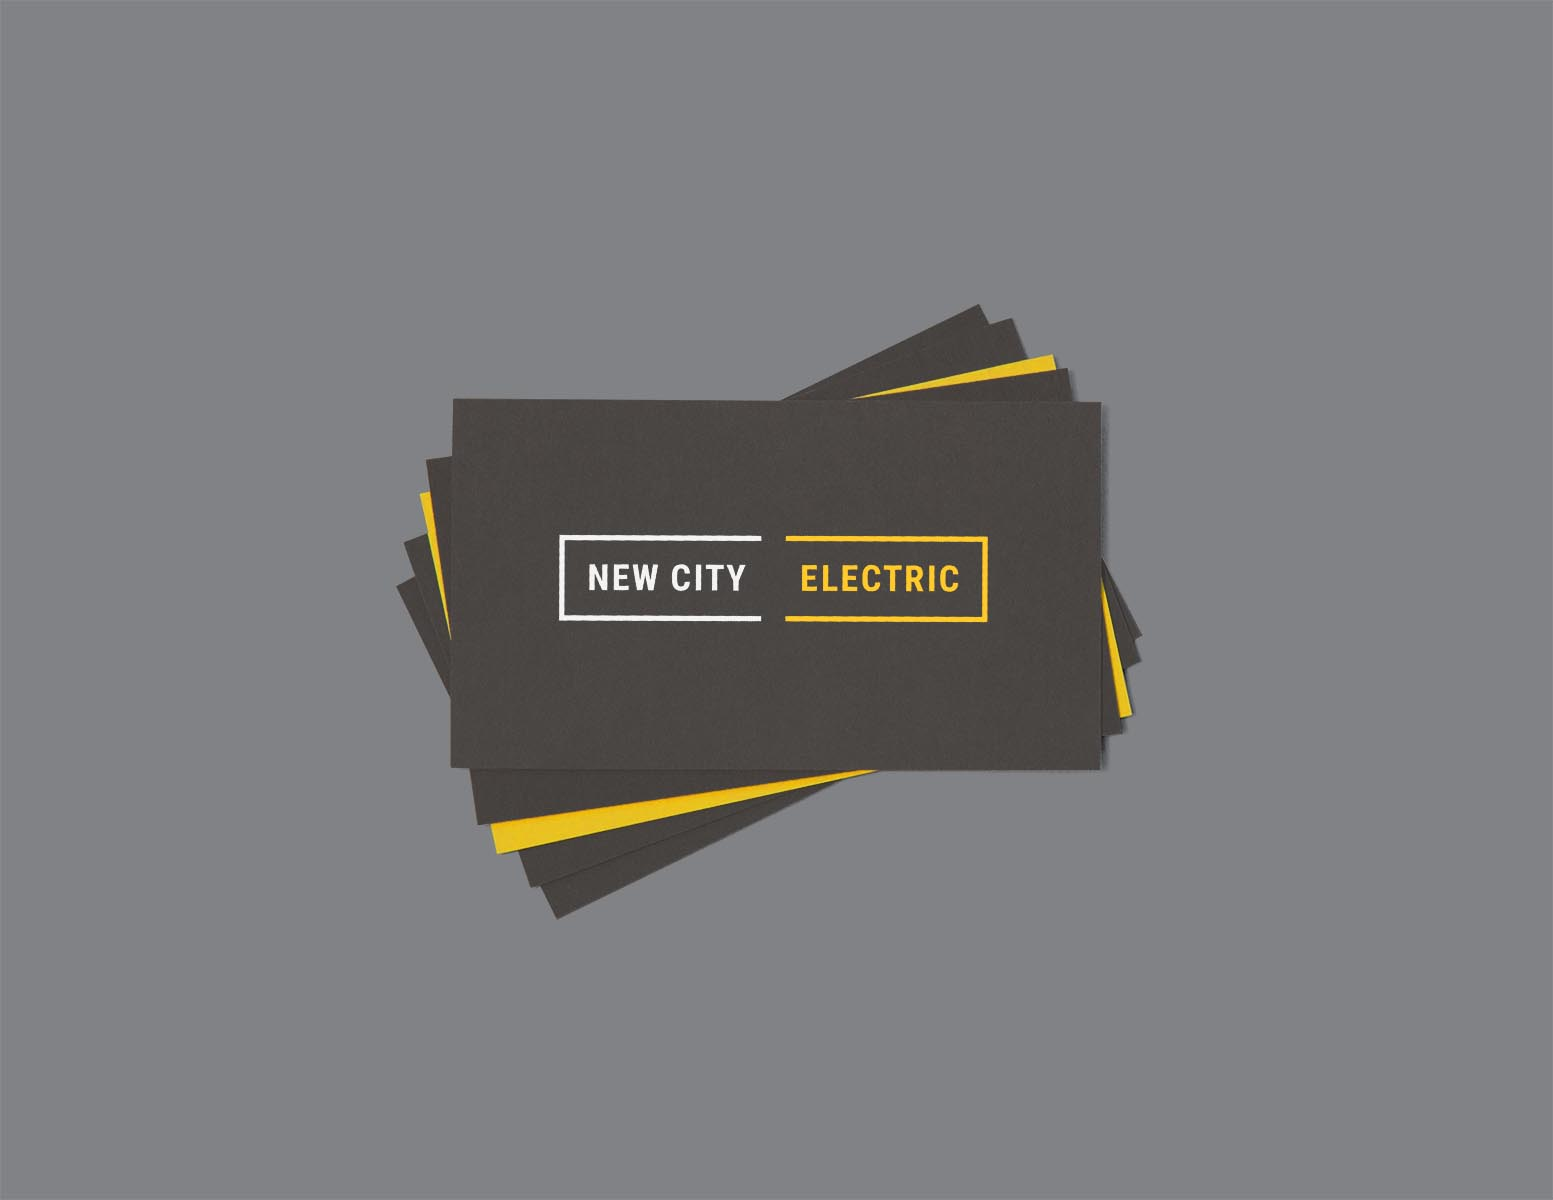 New_City_Electric_02.jpg